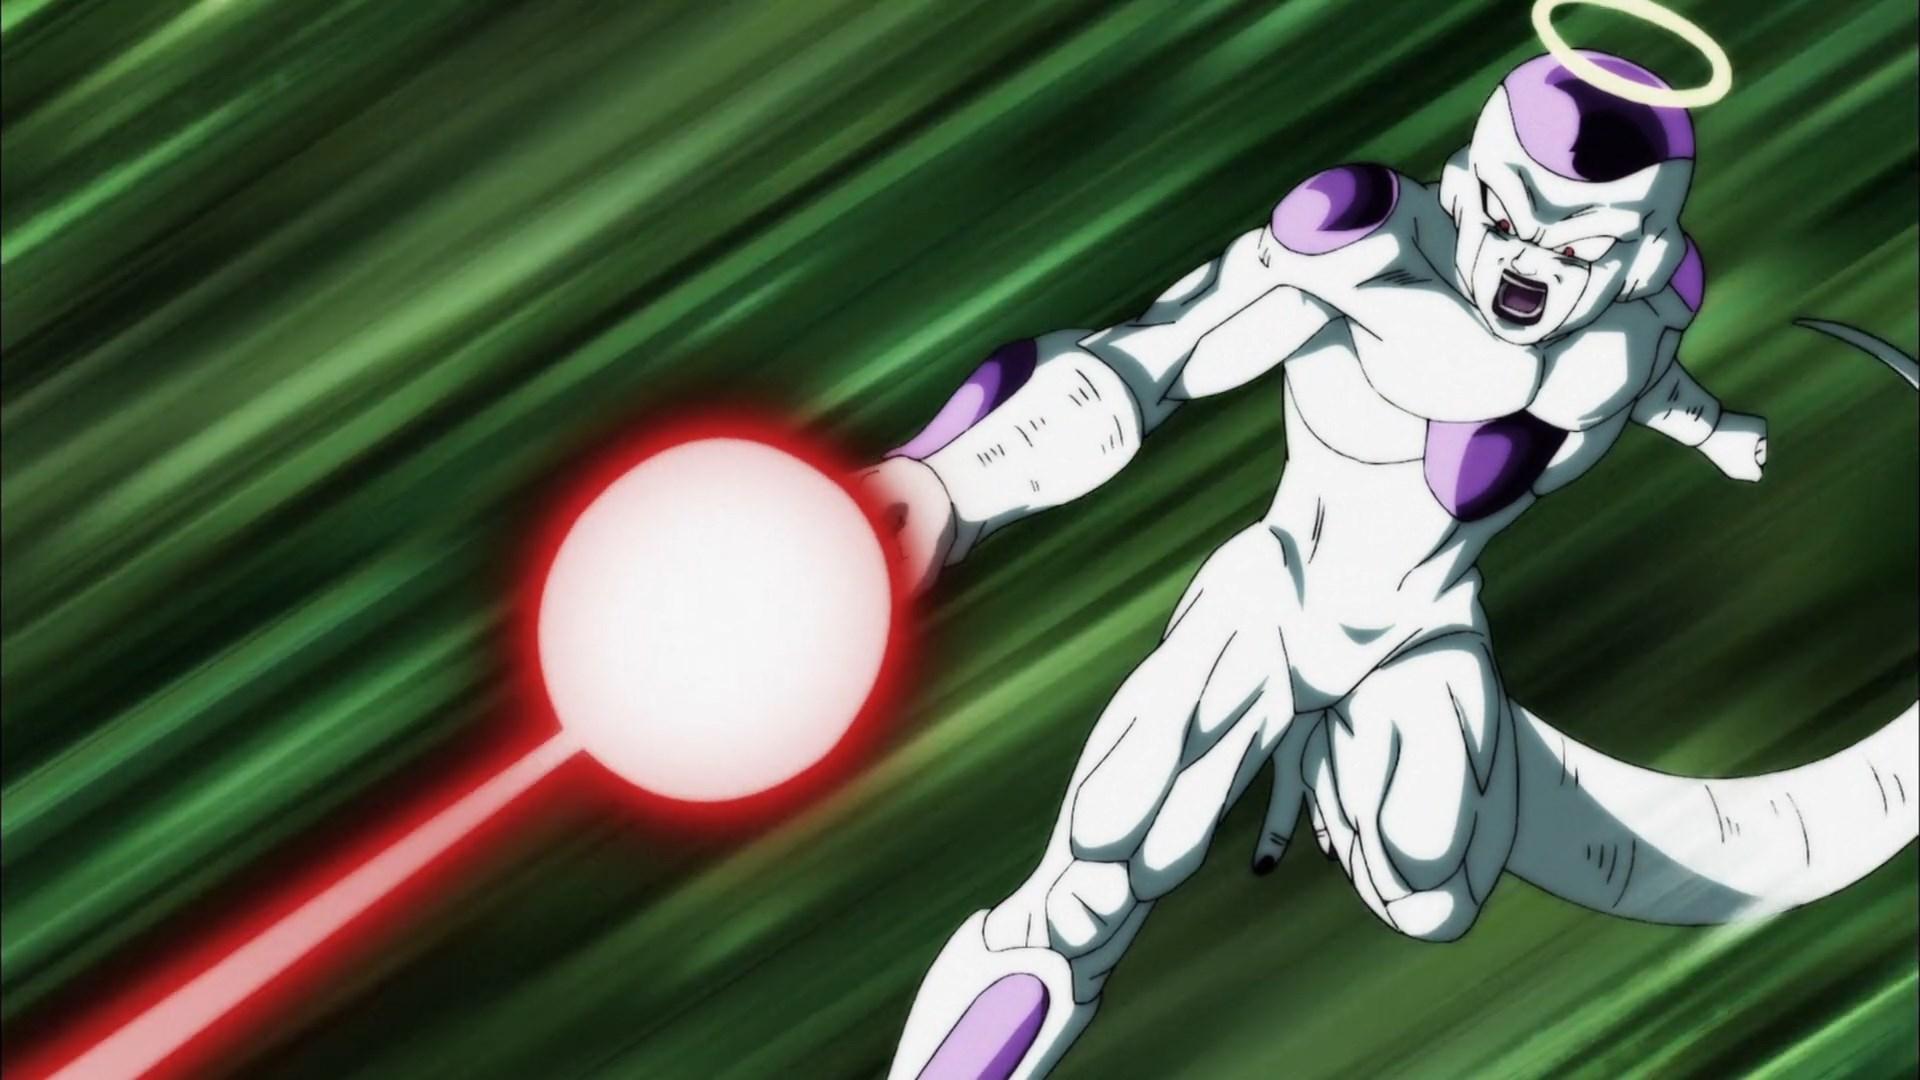 [HorribleSubs] Dragon Ball Super - 121 [1080p].mkv_snapshot_12.59